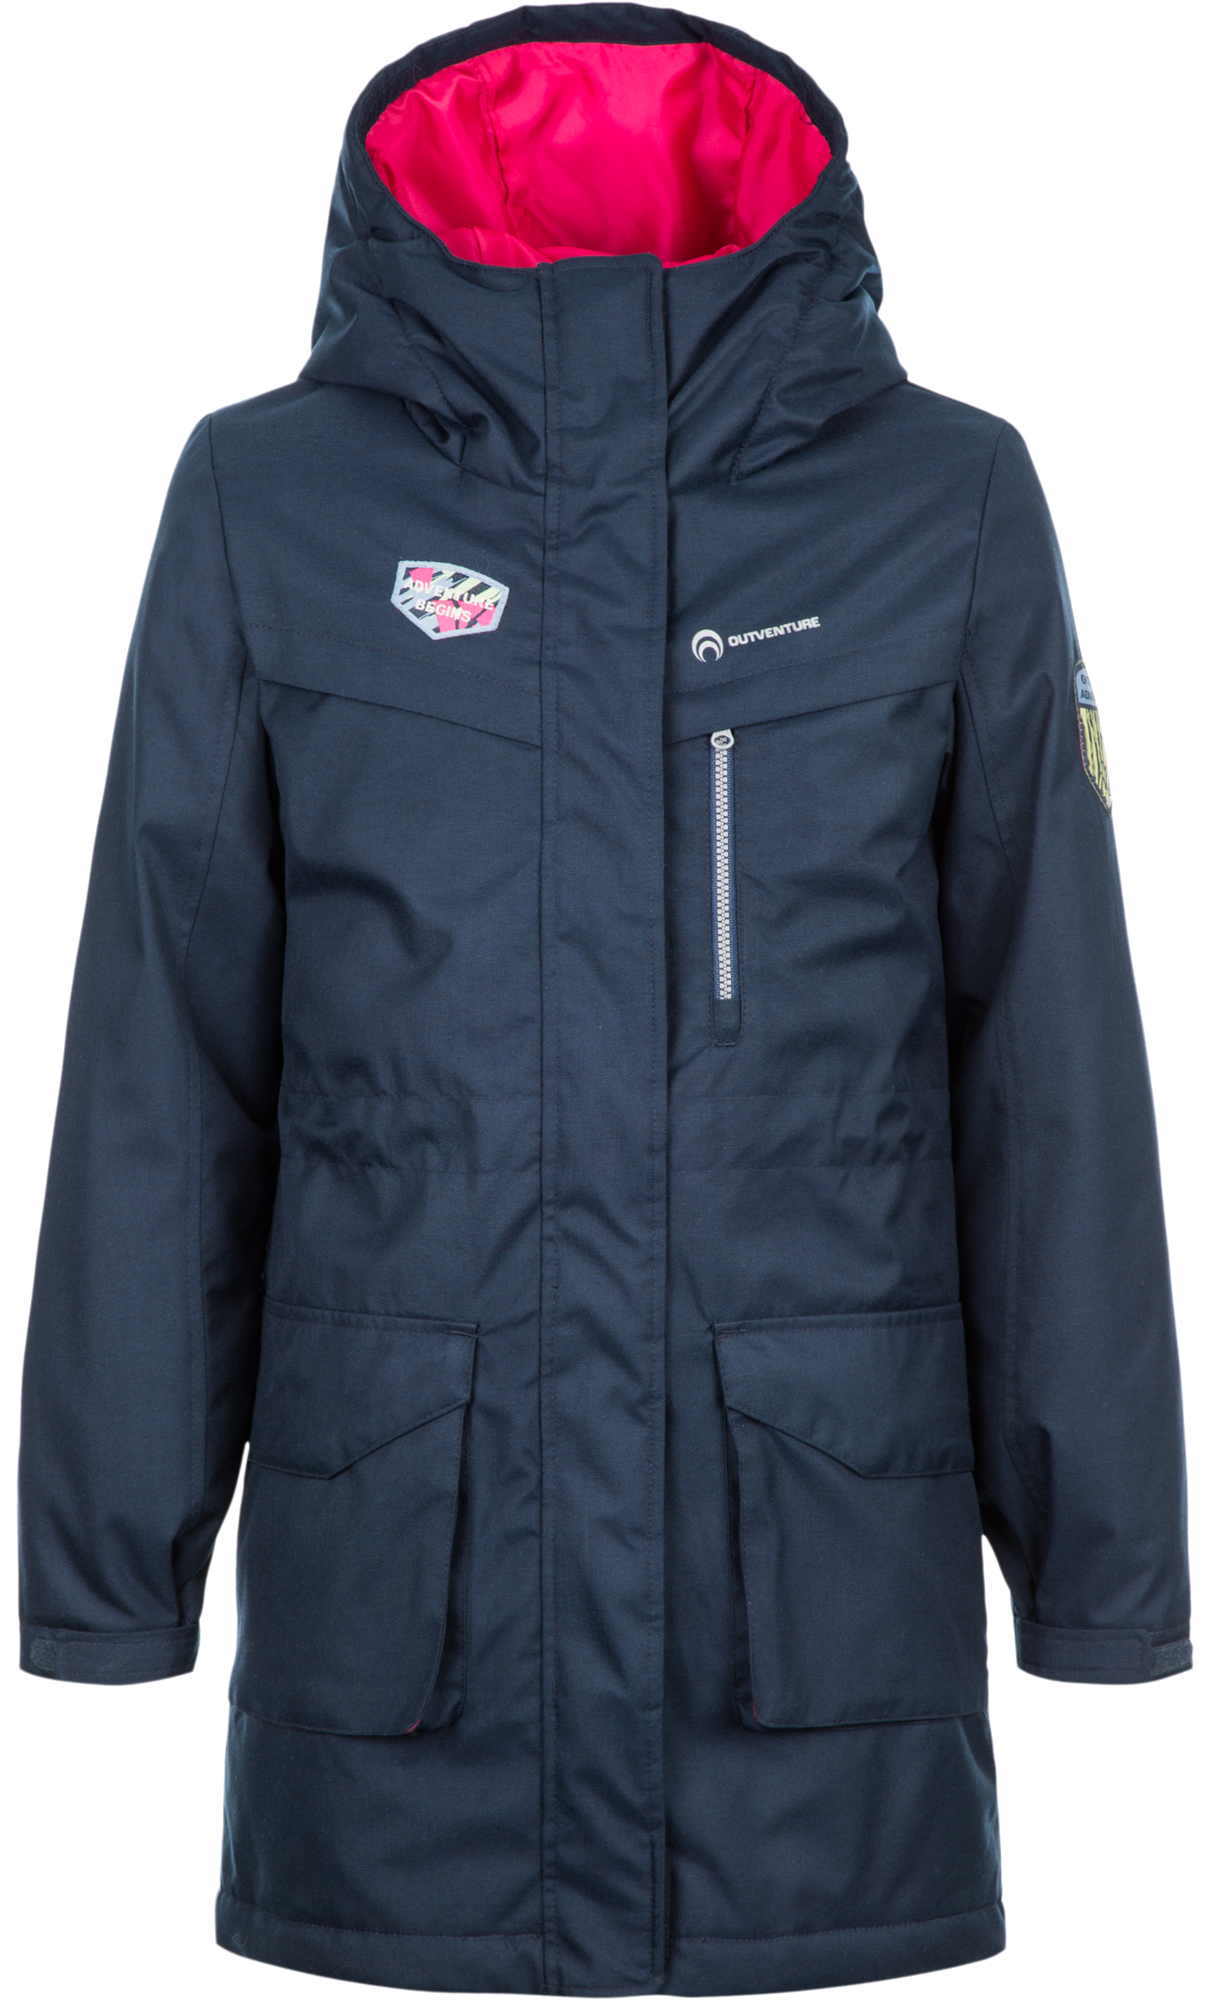 Outventure Куртка утепленная для девочек Outventure, размер 158